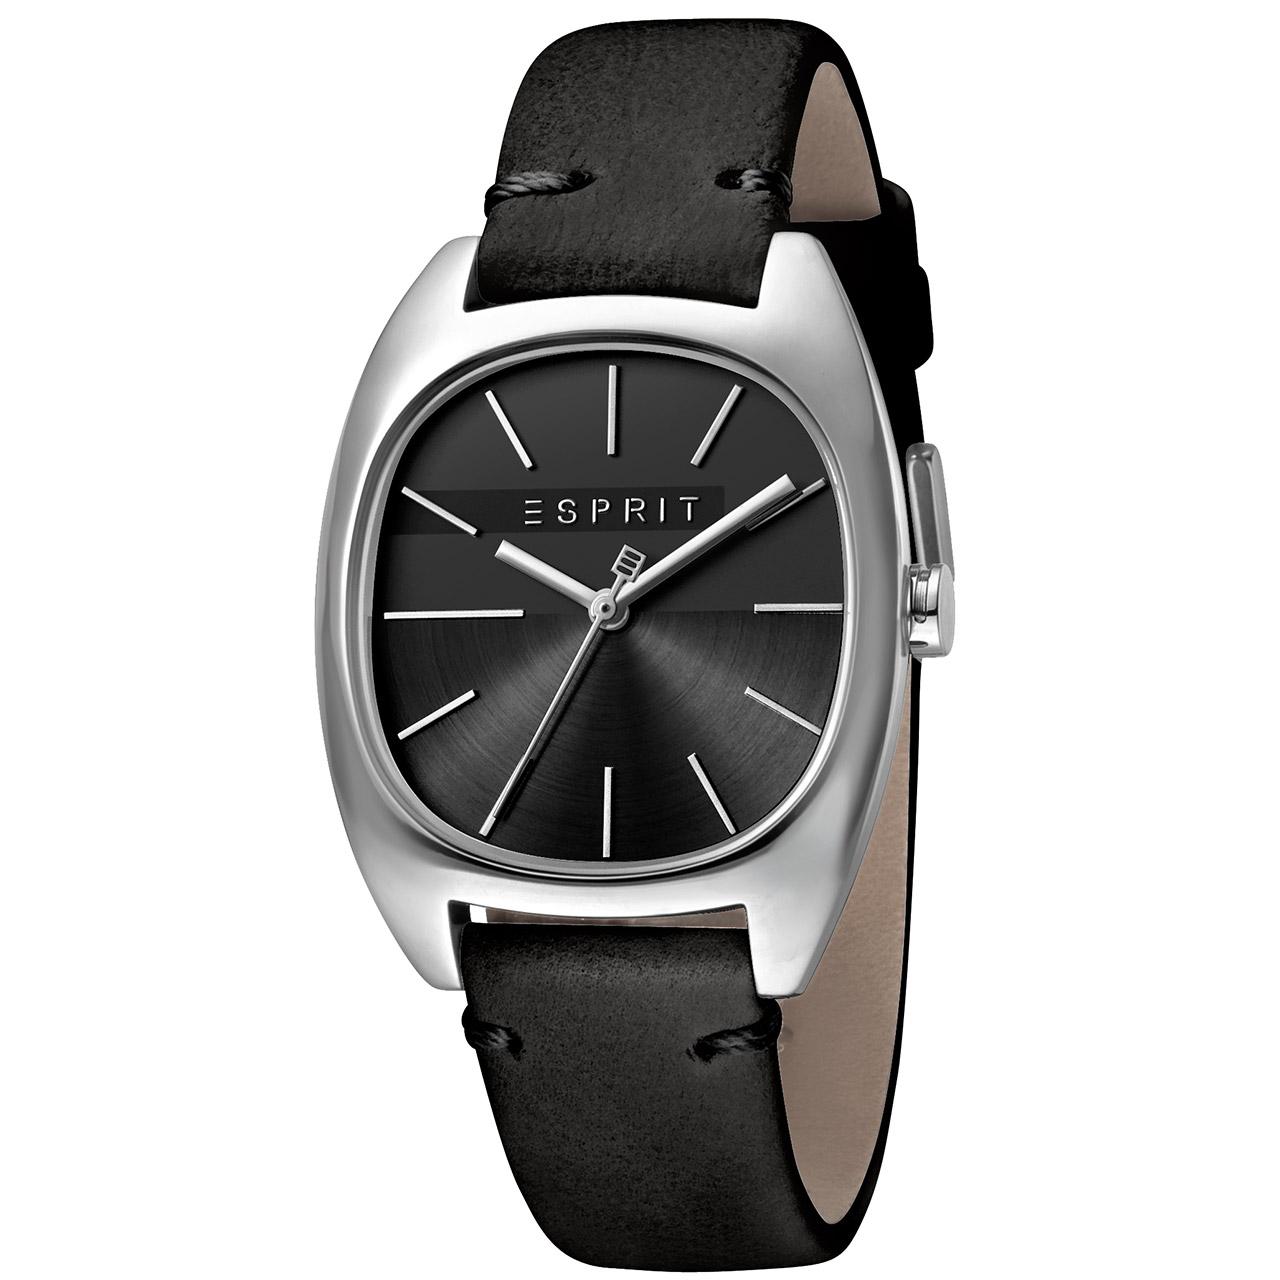 ساعت مچی عقربه ای زنانه اسپریت مدل ES1L038L0025 30